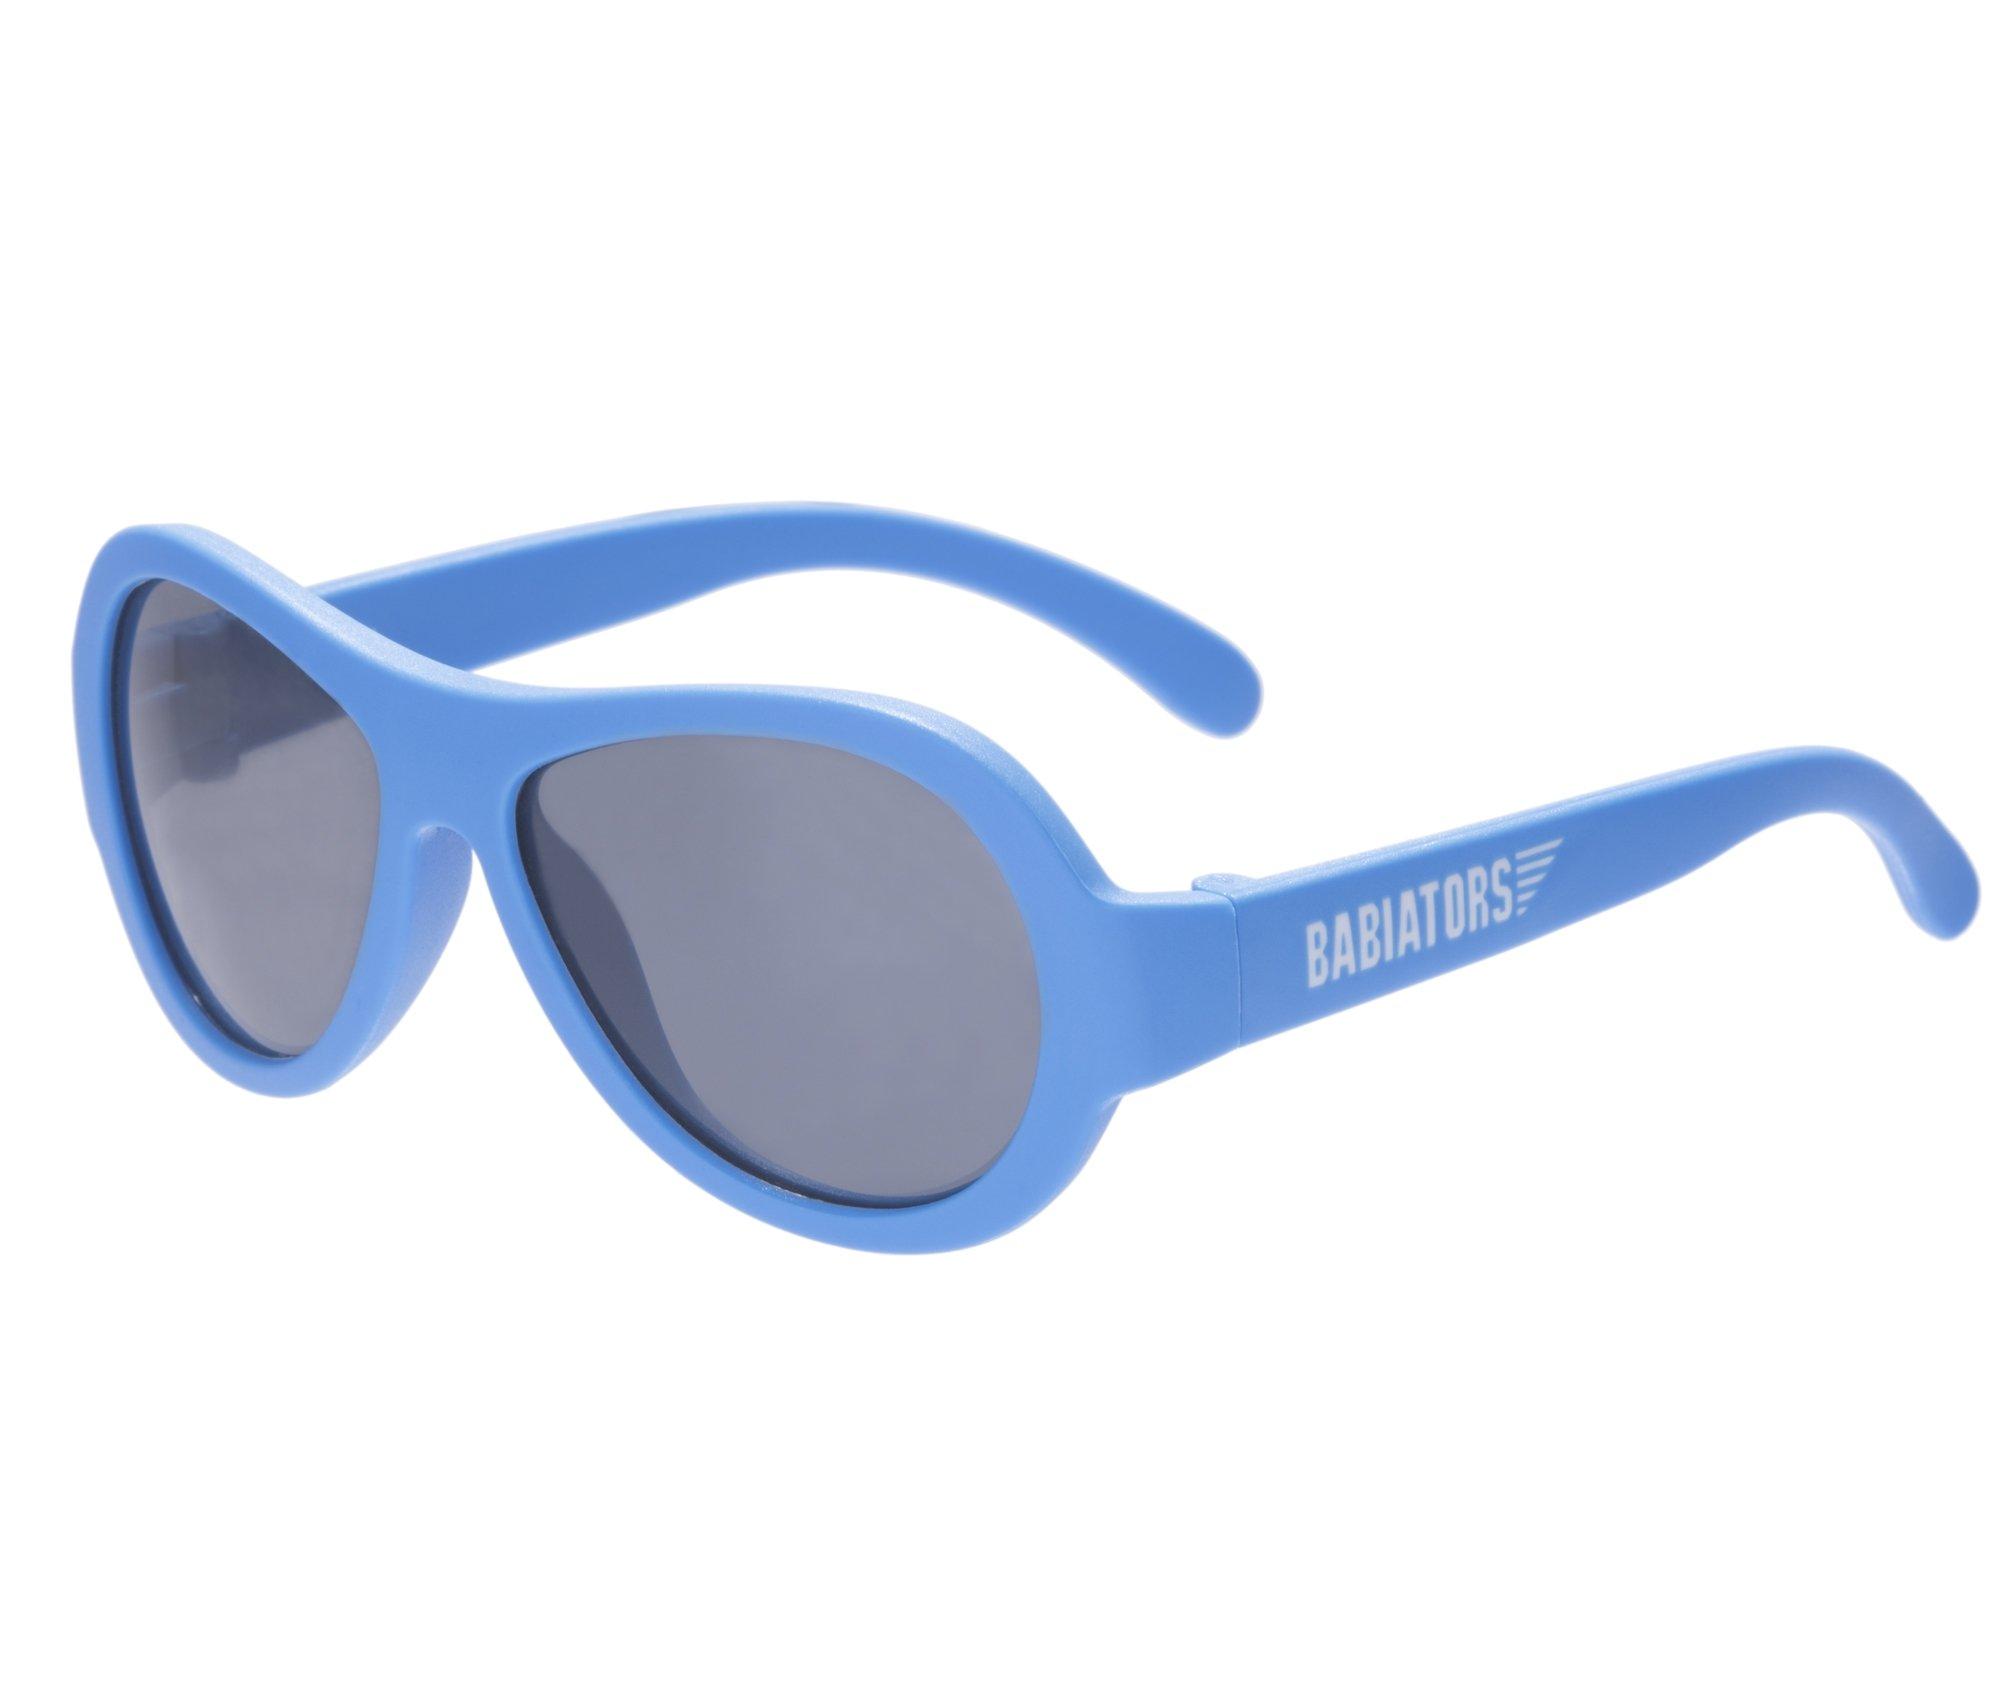 Babiators - Original Aviator Kids Sunglasses - True Blue (0-2 years)